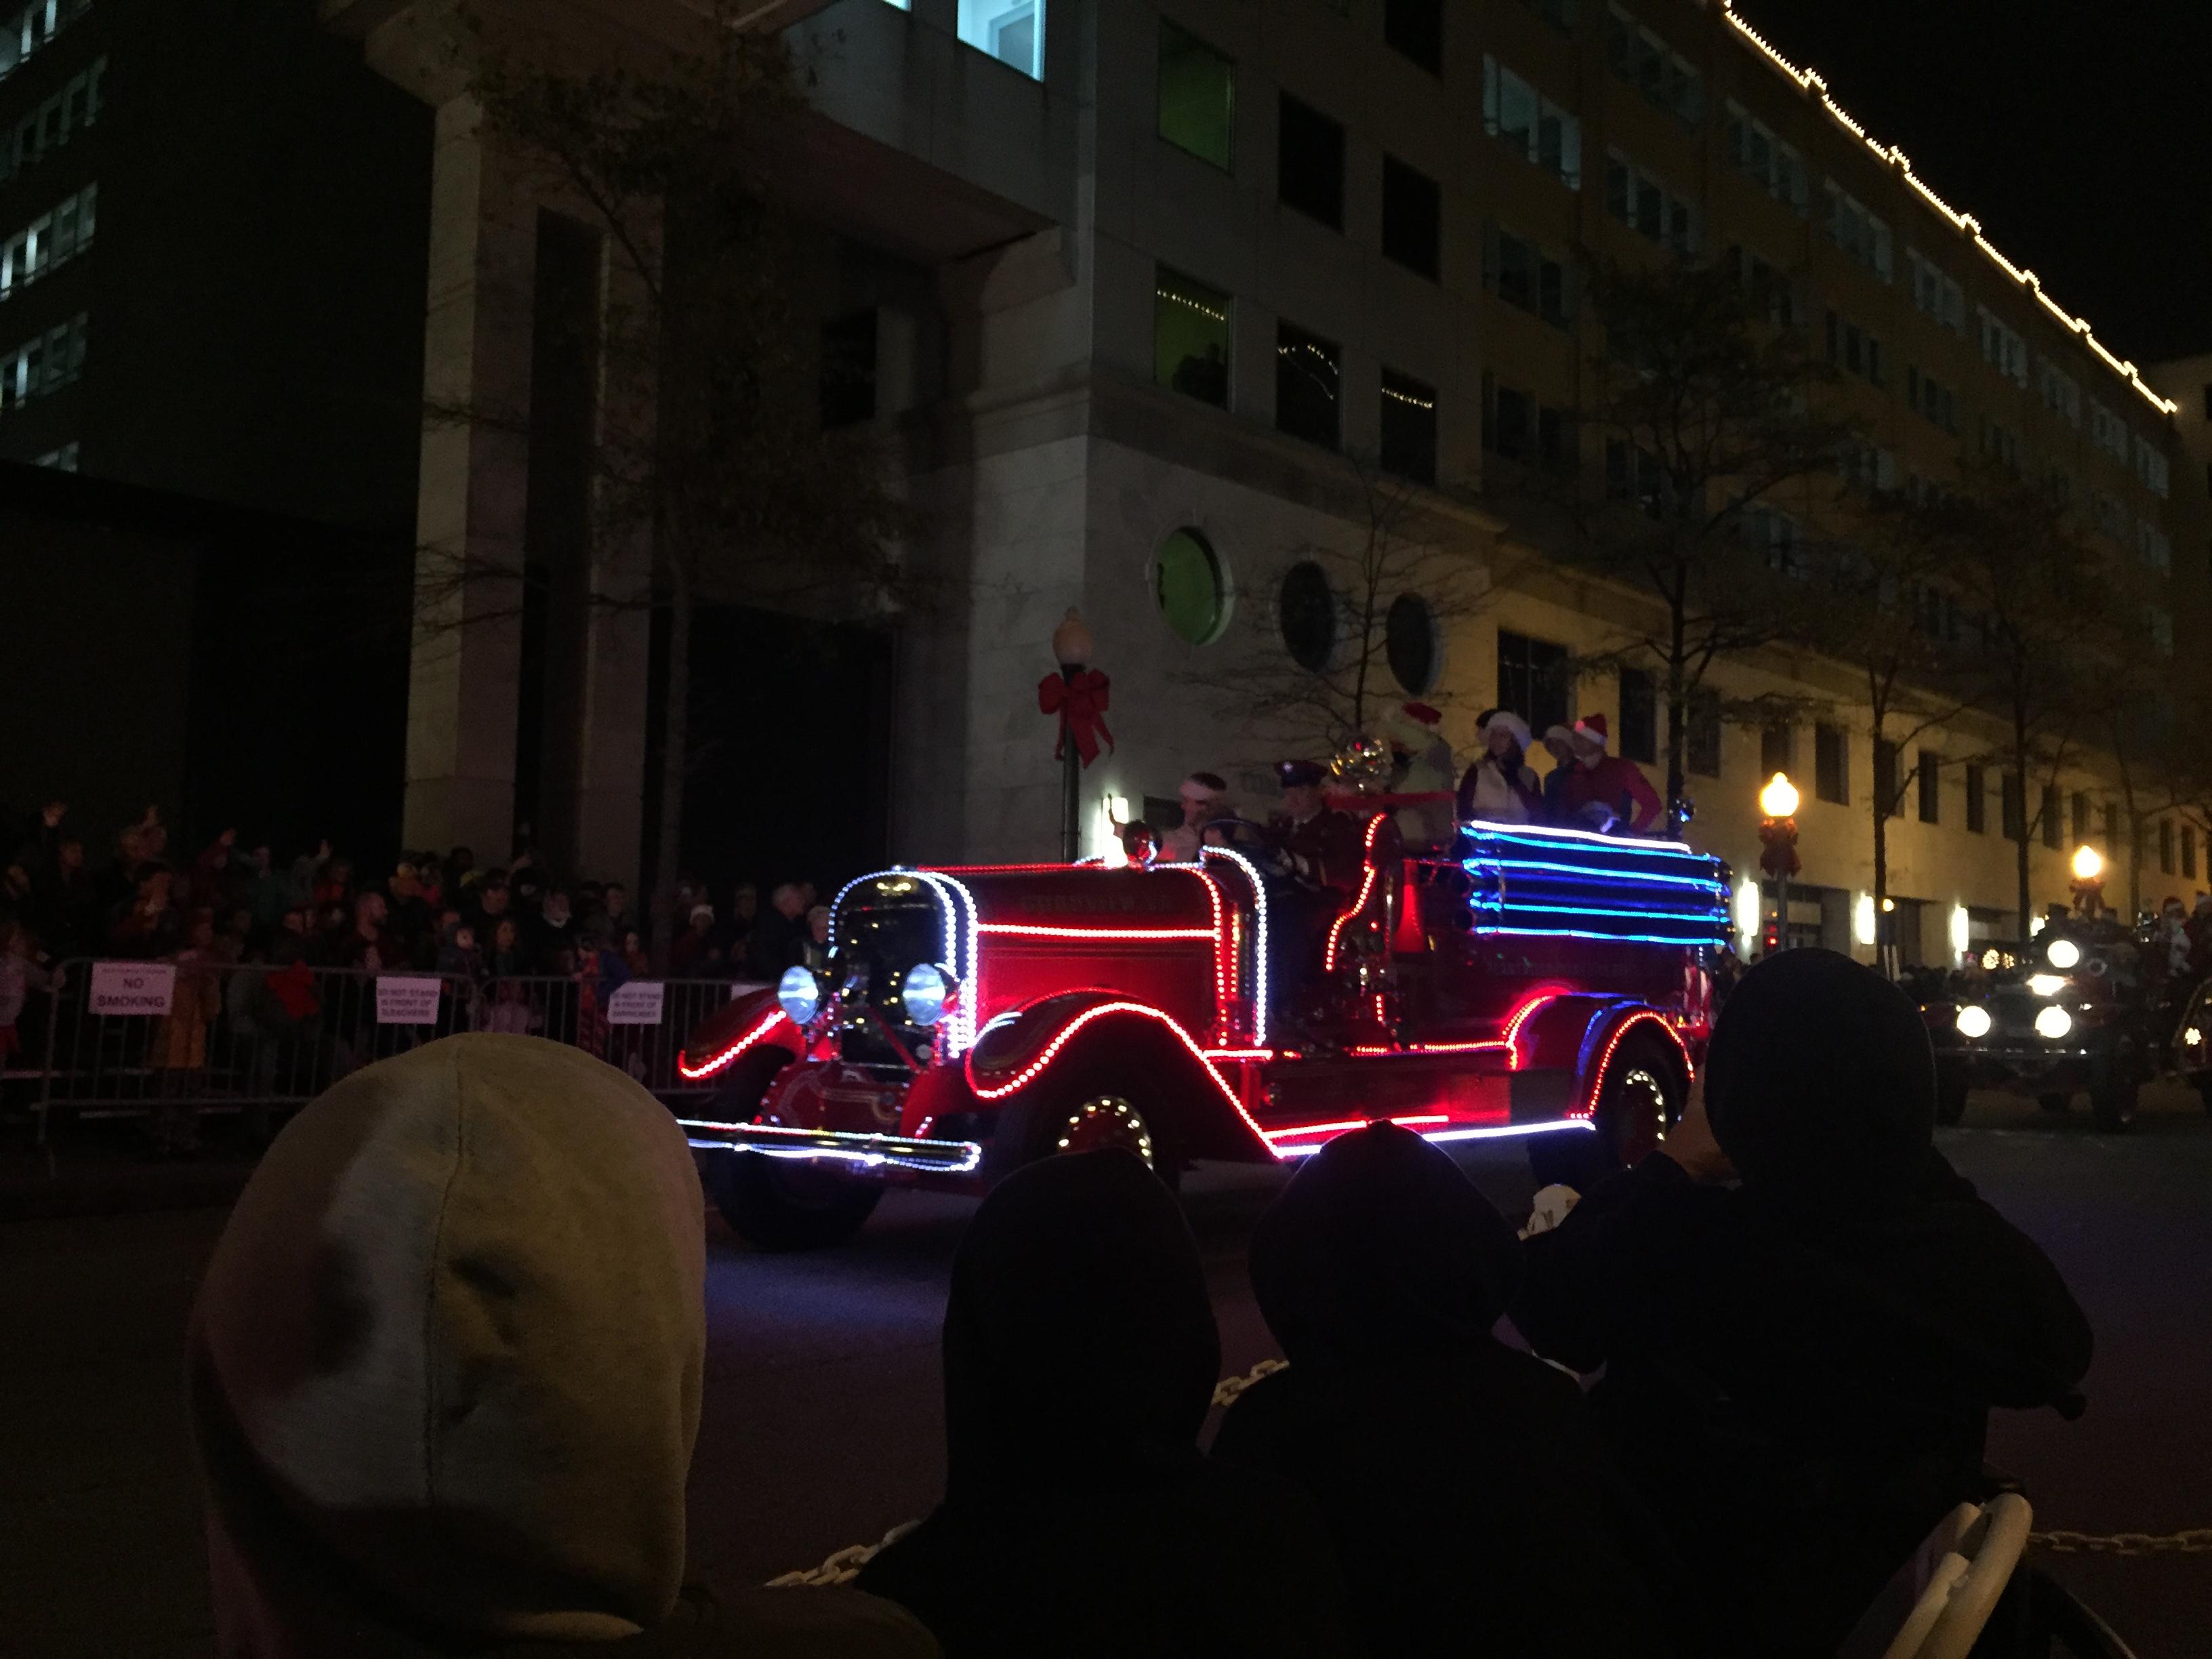 WATCH: The 2016 Grand Illumination Parade | 13NEWSNOW.com